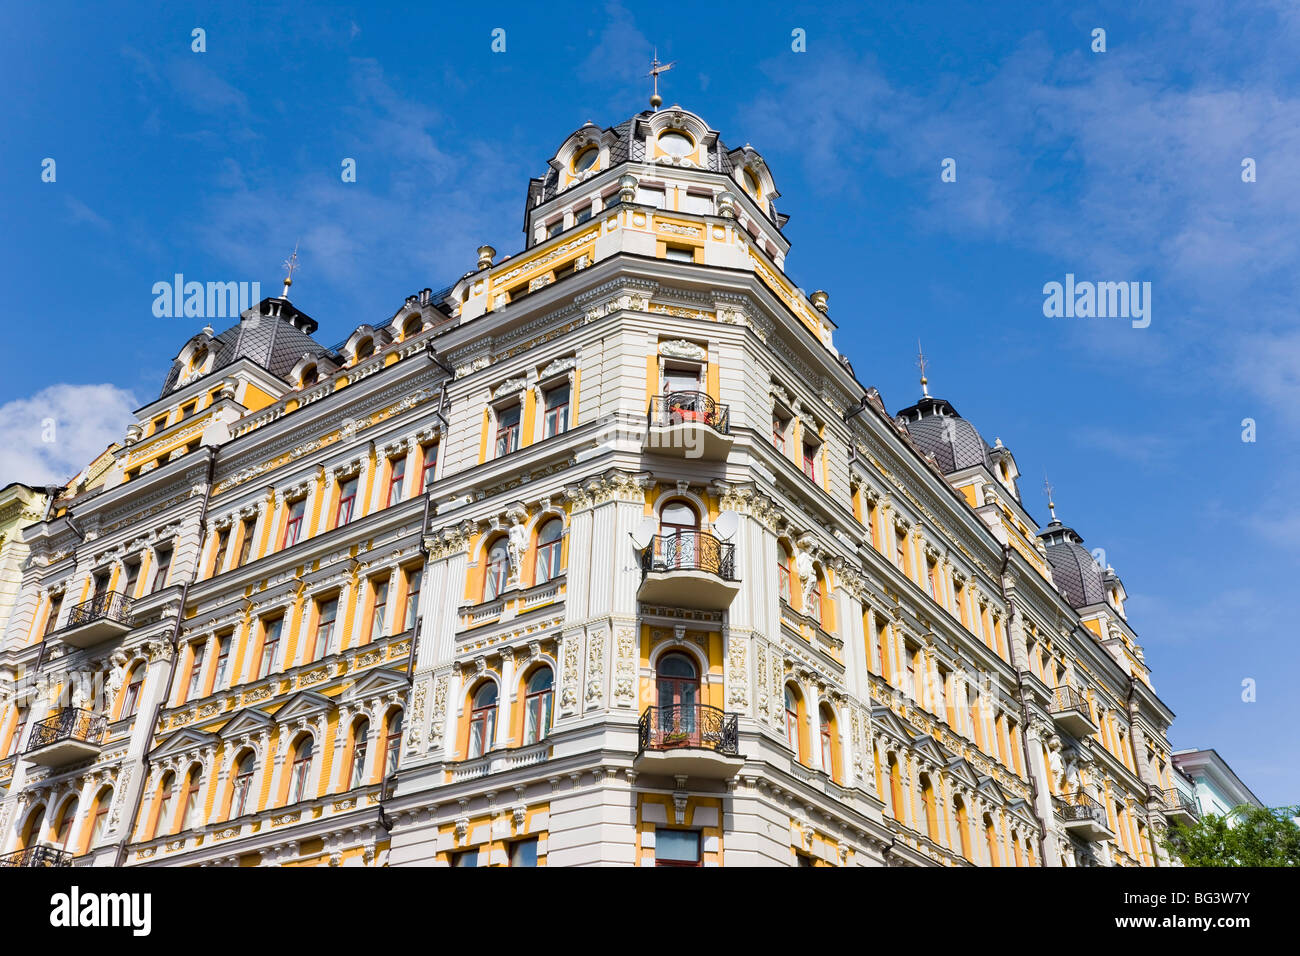 Stalinist architecture on Khreschatik Avenue, Kiev, Ukraine, Europe - Stock Image